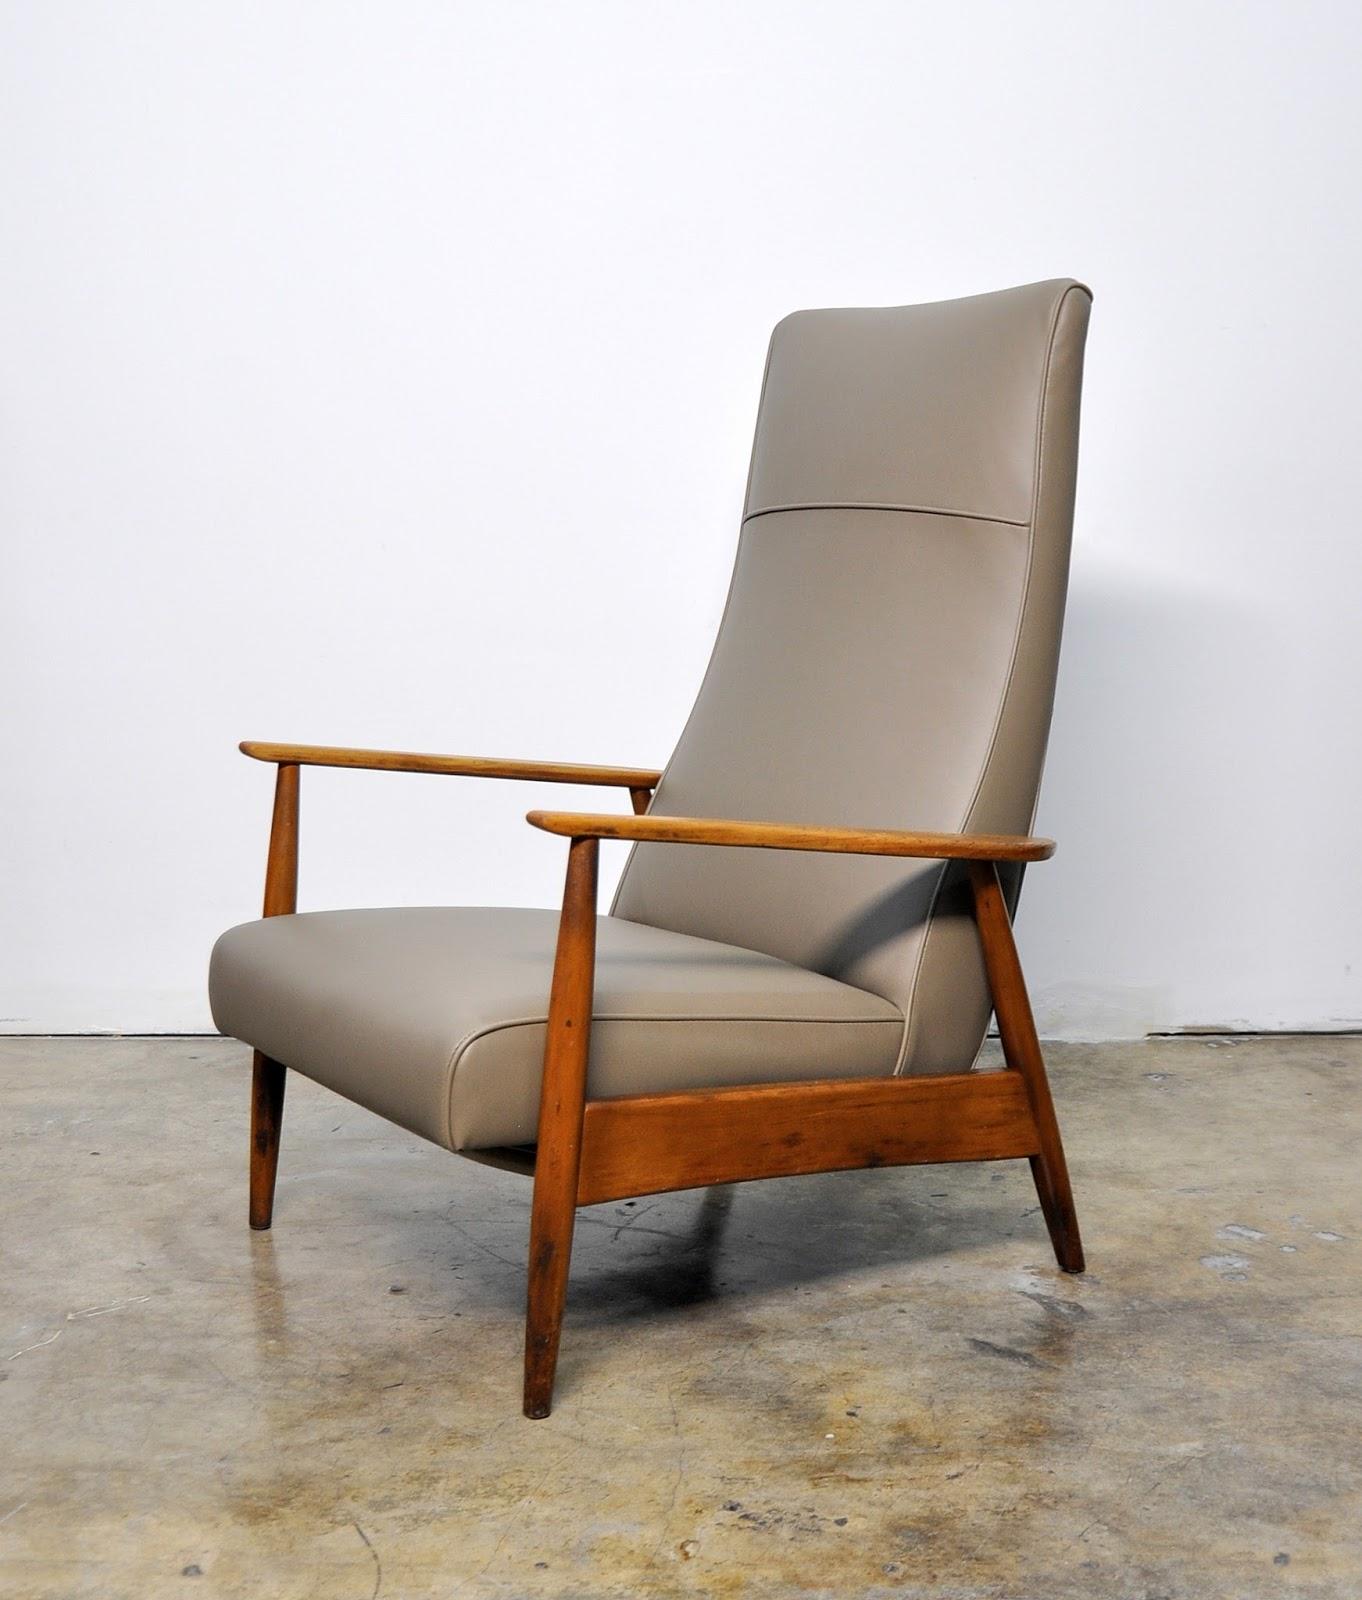 James Inc. or Thayer Coggin & SELECT MODERN: Milo Baughman Recliner Lounge Chair islam-shia.org